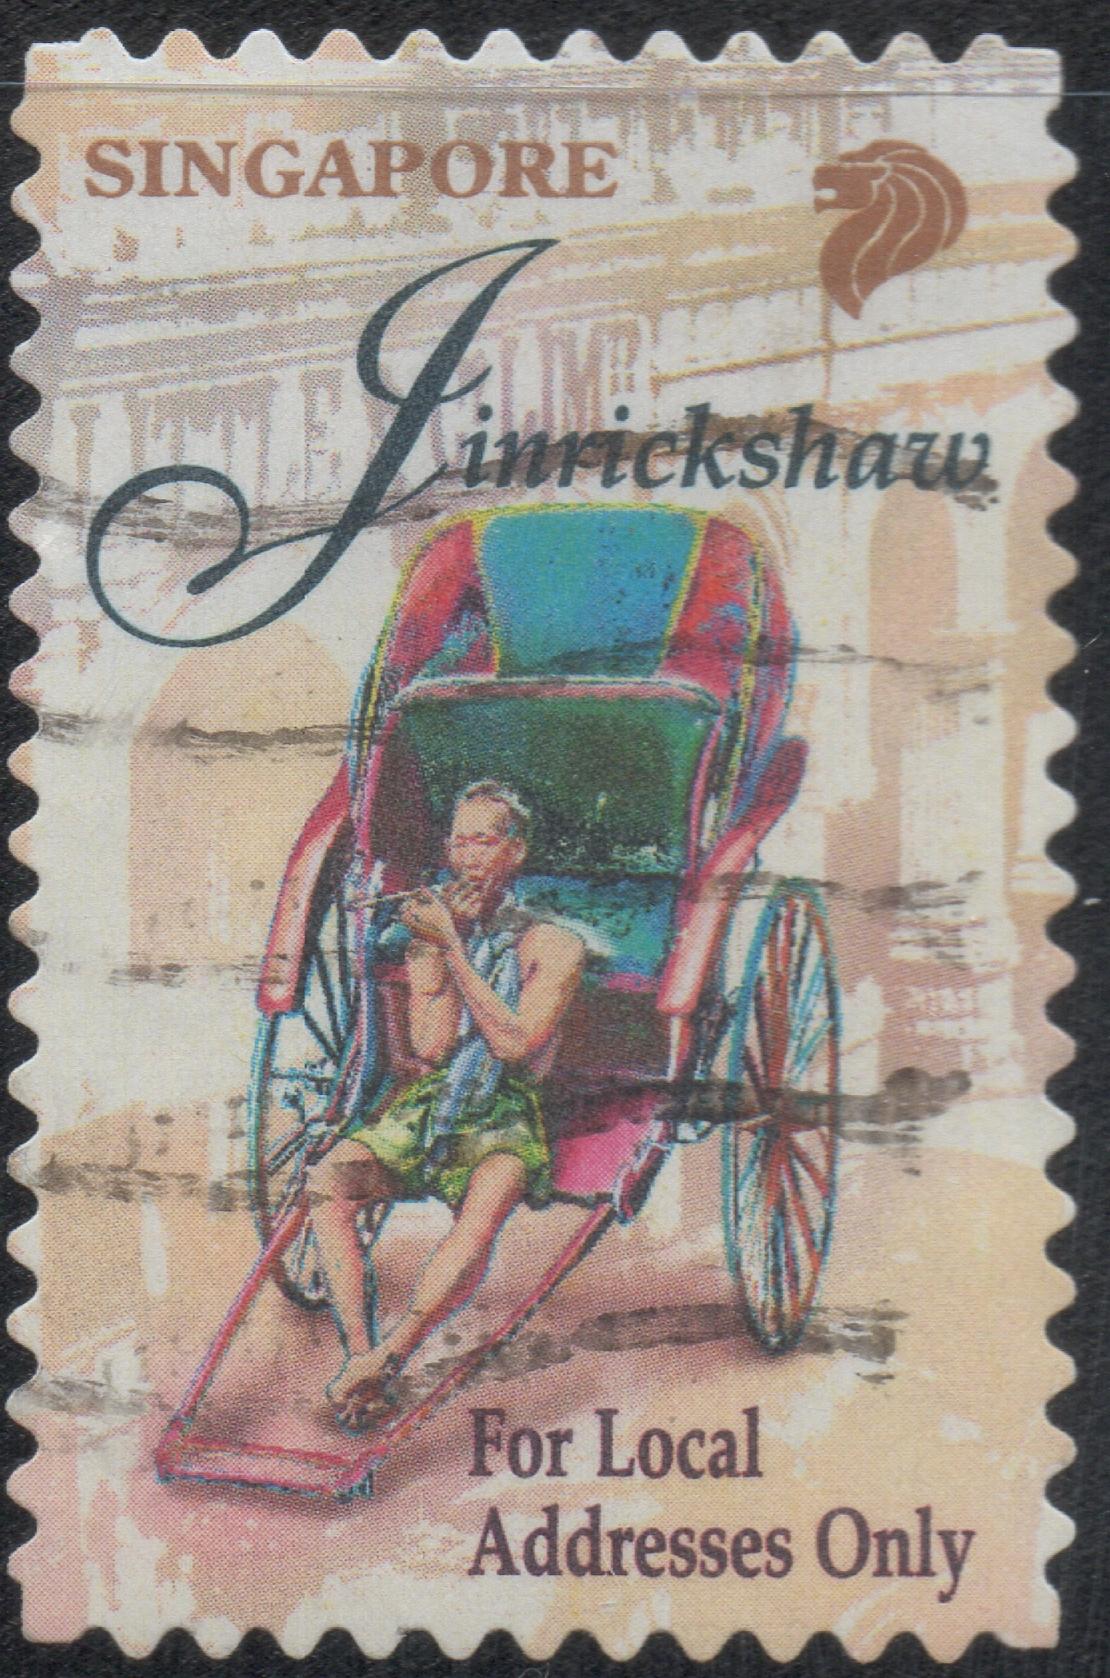 Singapore - Scott #789 (1997)